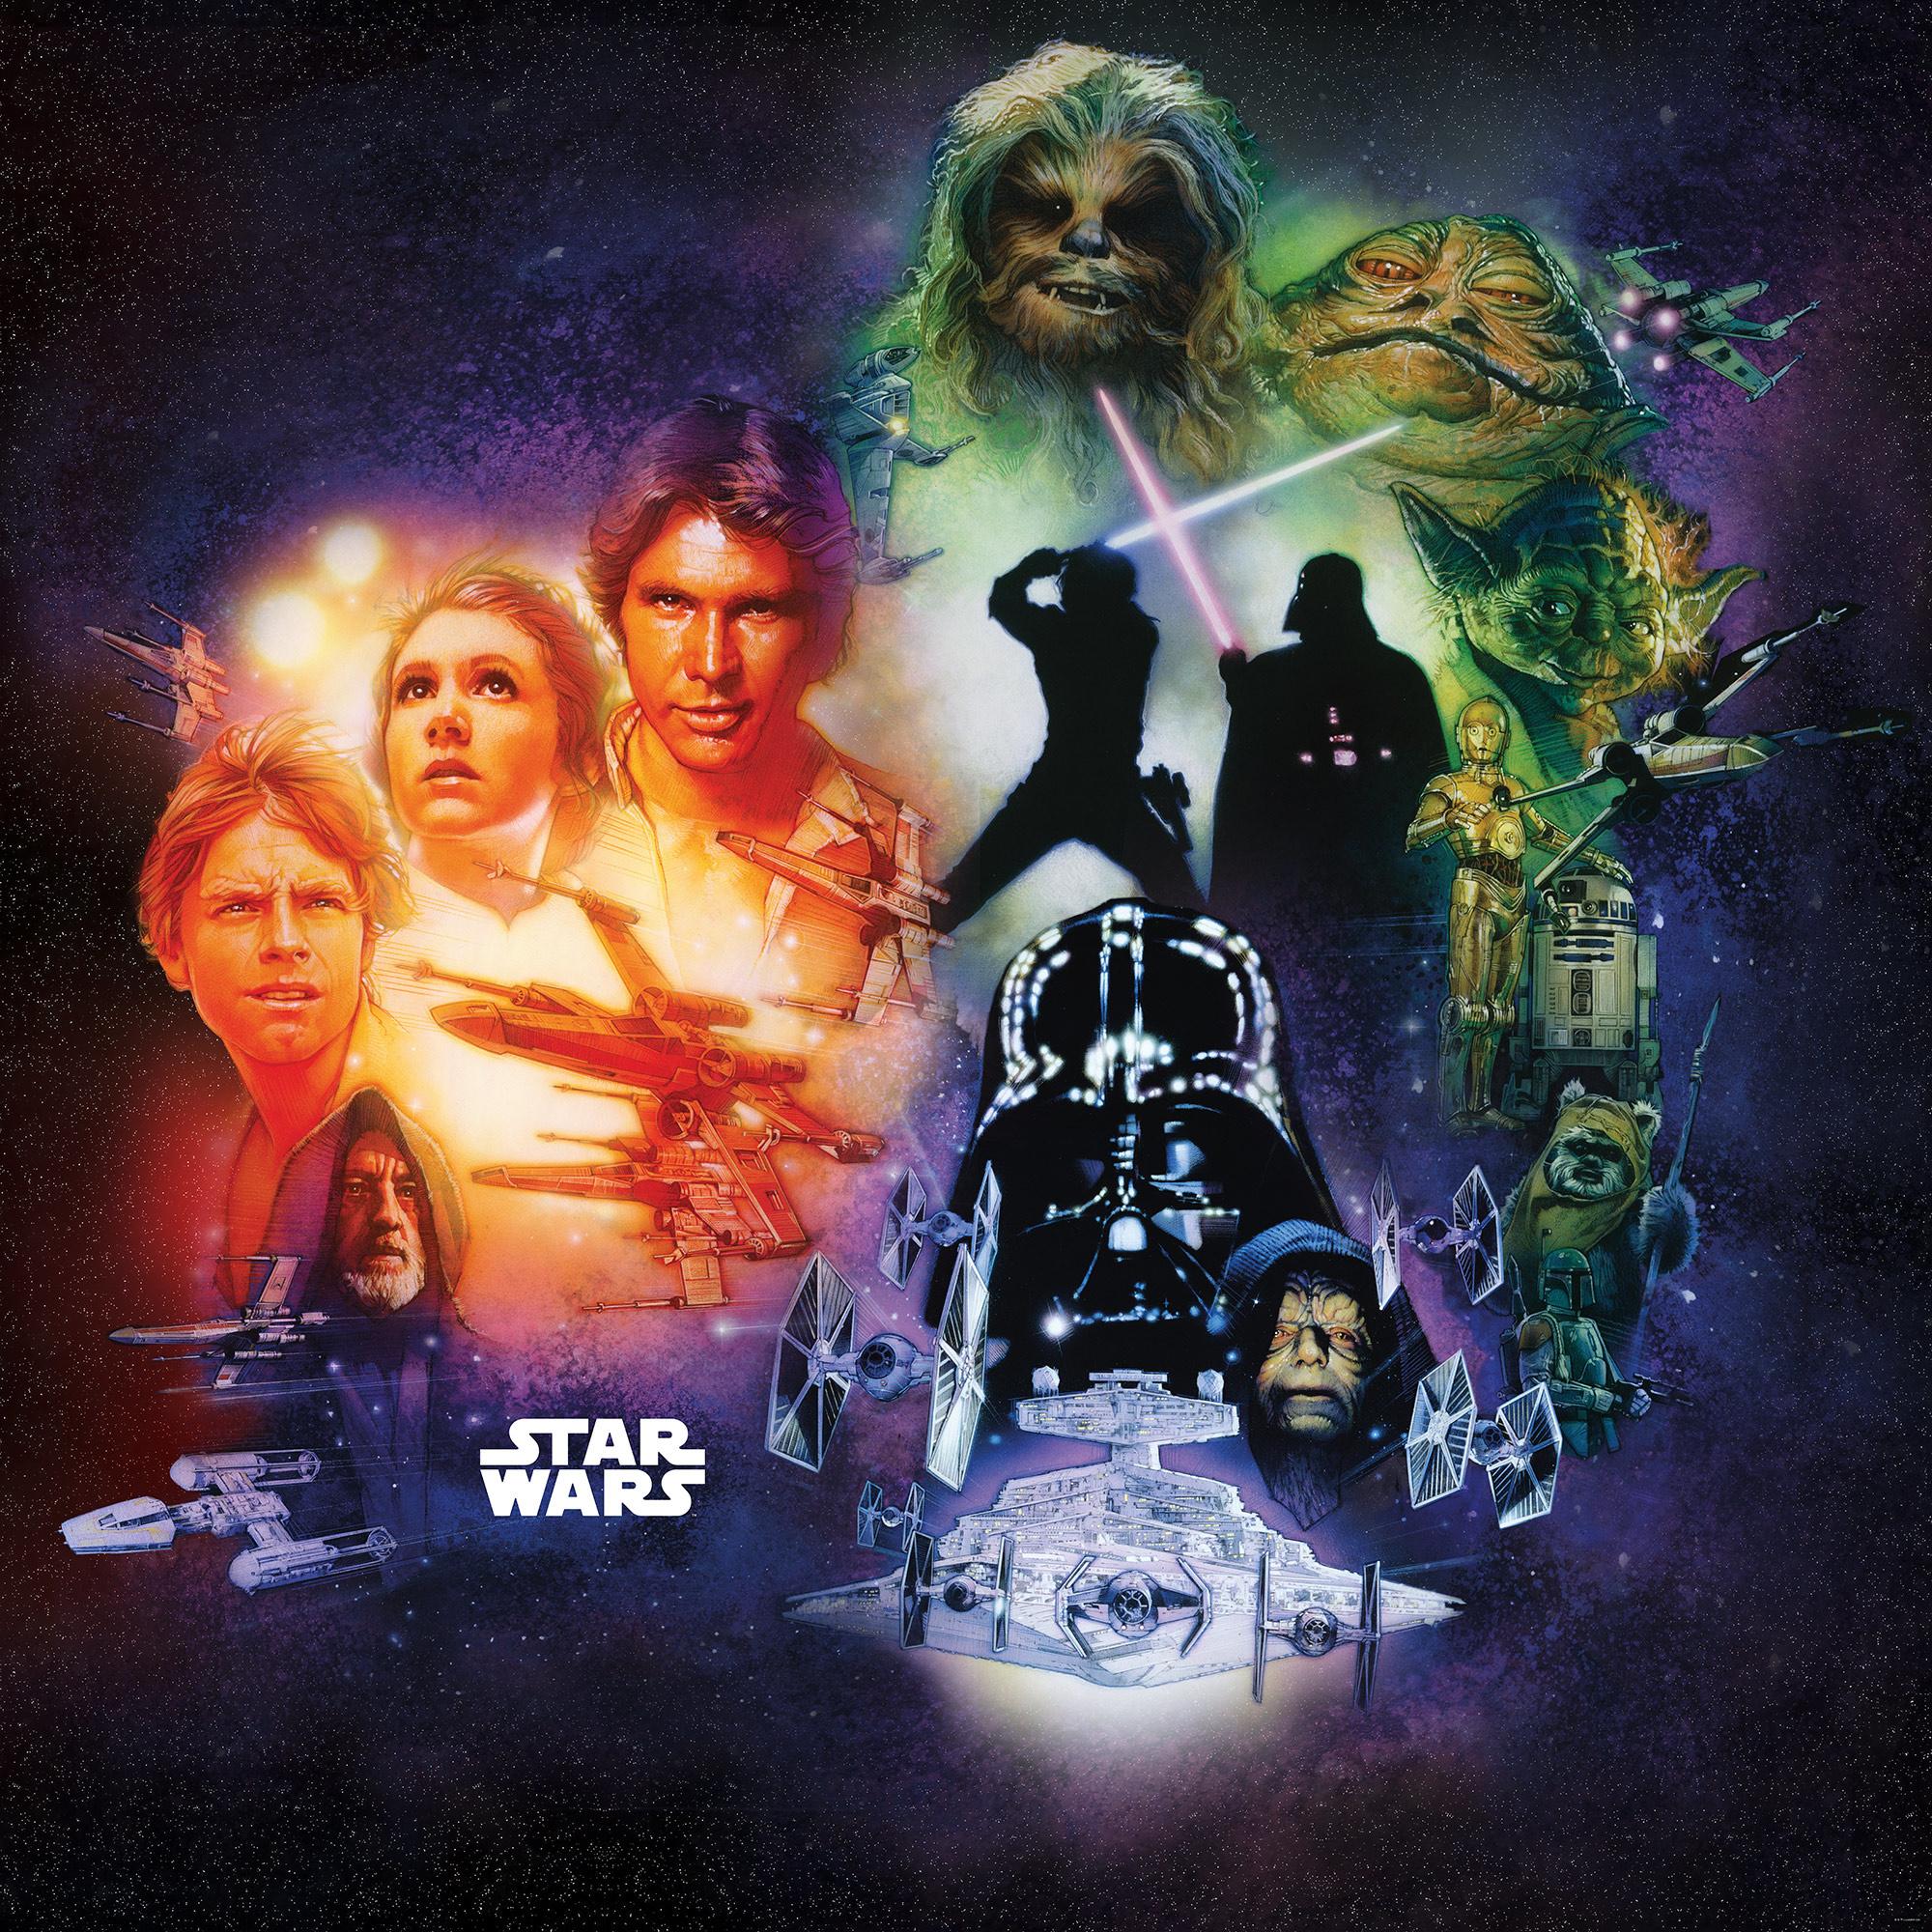 Disney Edition 4 Kinderbehang Komar - Kinderkamer behang Star Wars Classic Poster Collage